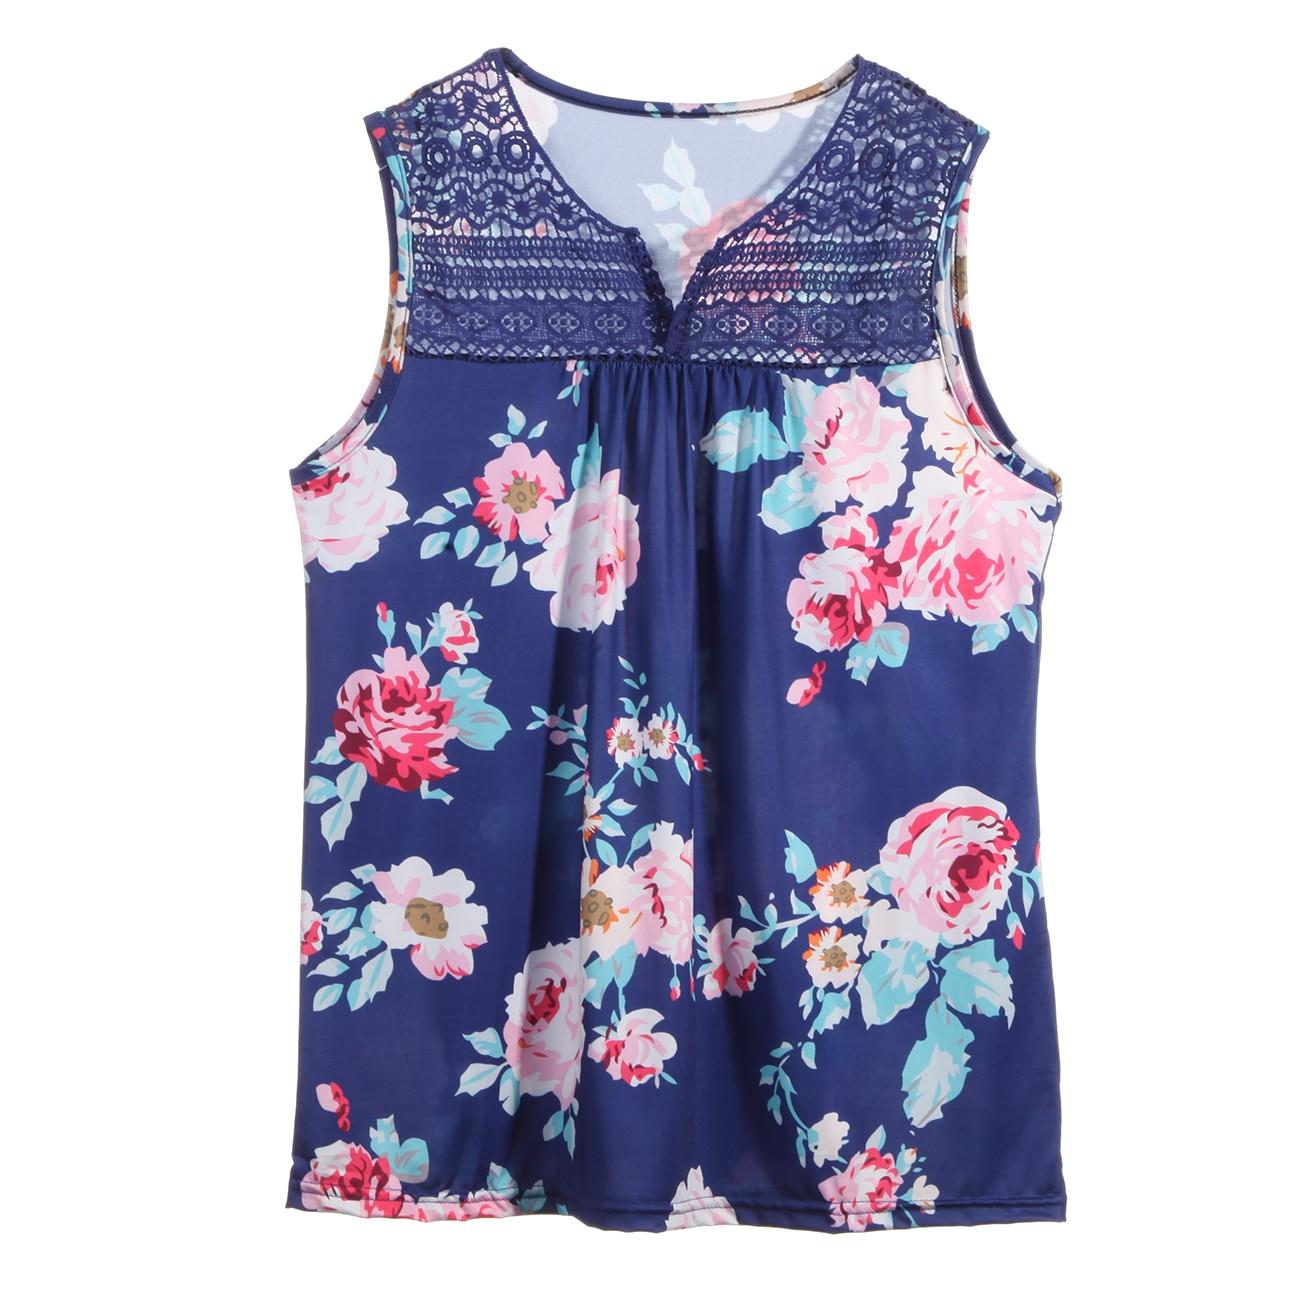 Fashion Women Casual Tank Tops Summer Loose Sleeveless Shirt Blouse Vest